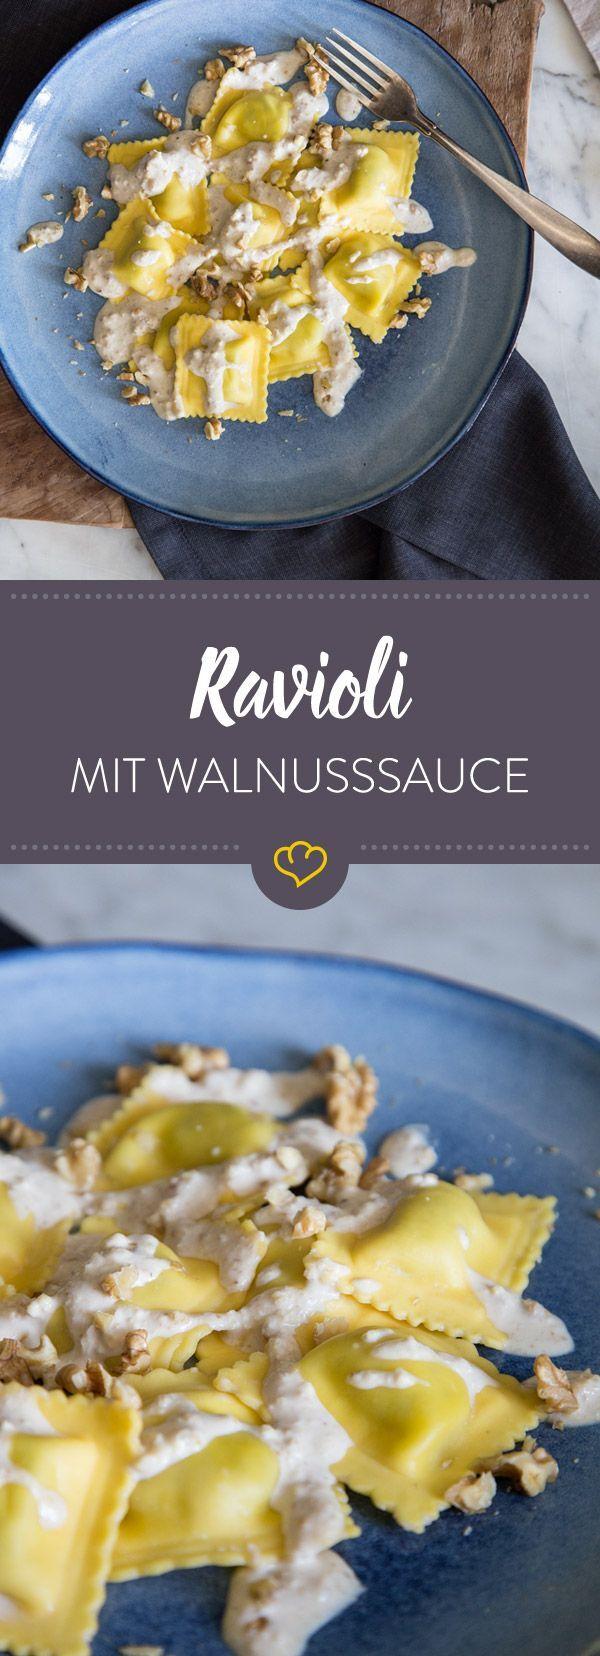 Photo of Ravioli with Ligurian walnut sauce